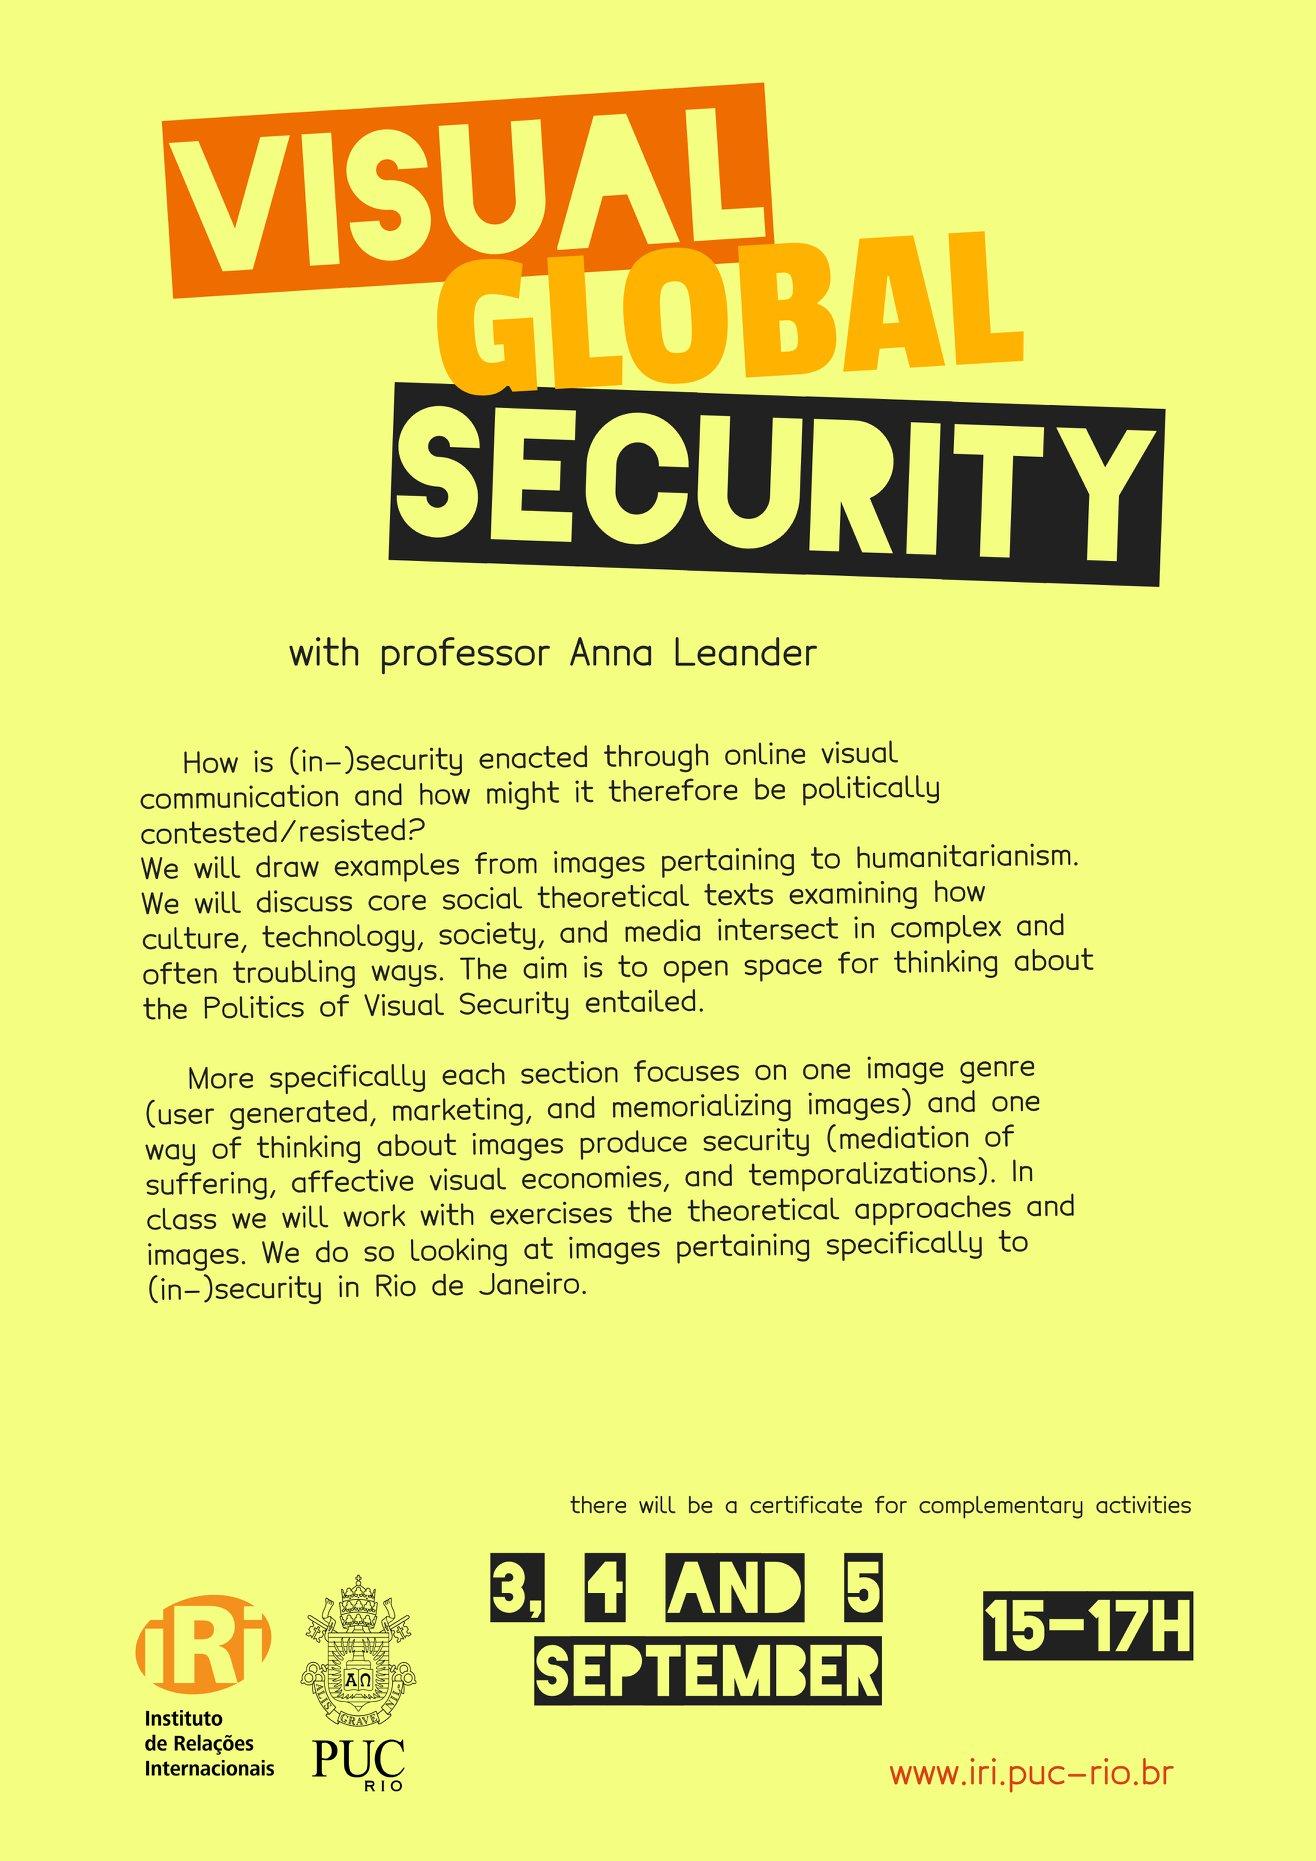 Visual Global Security